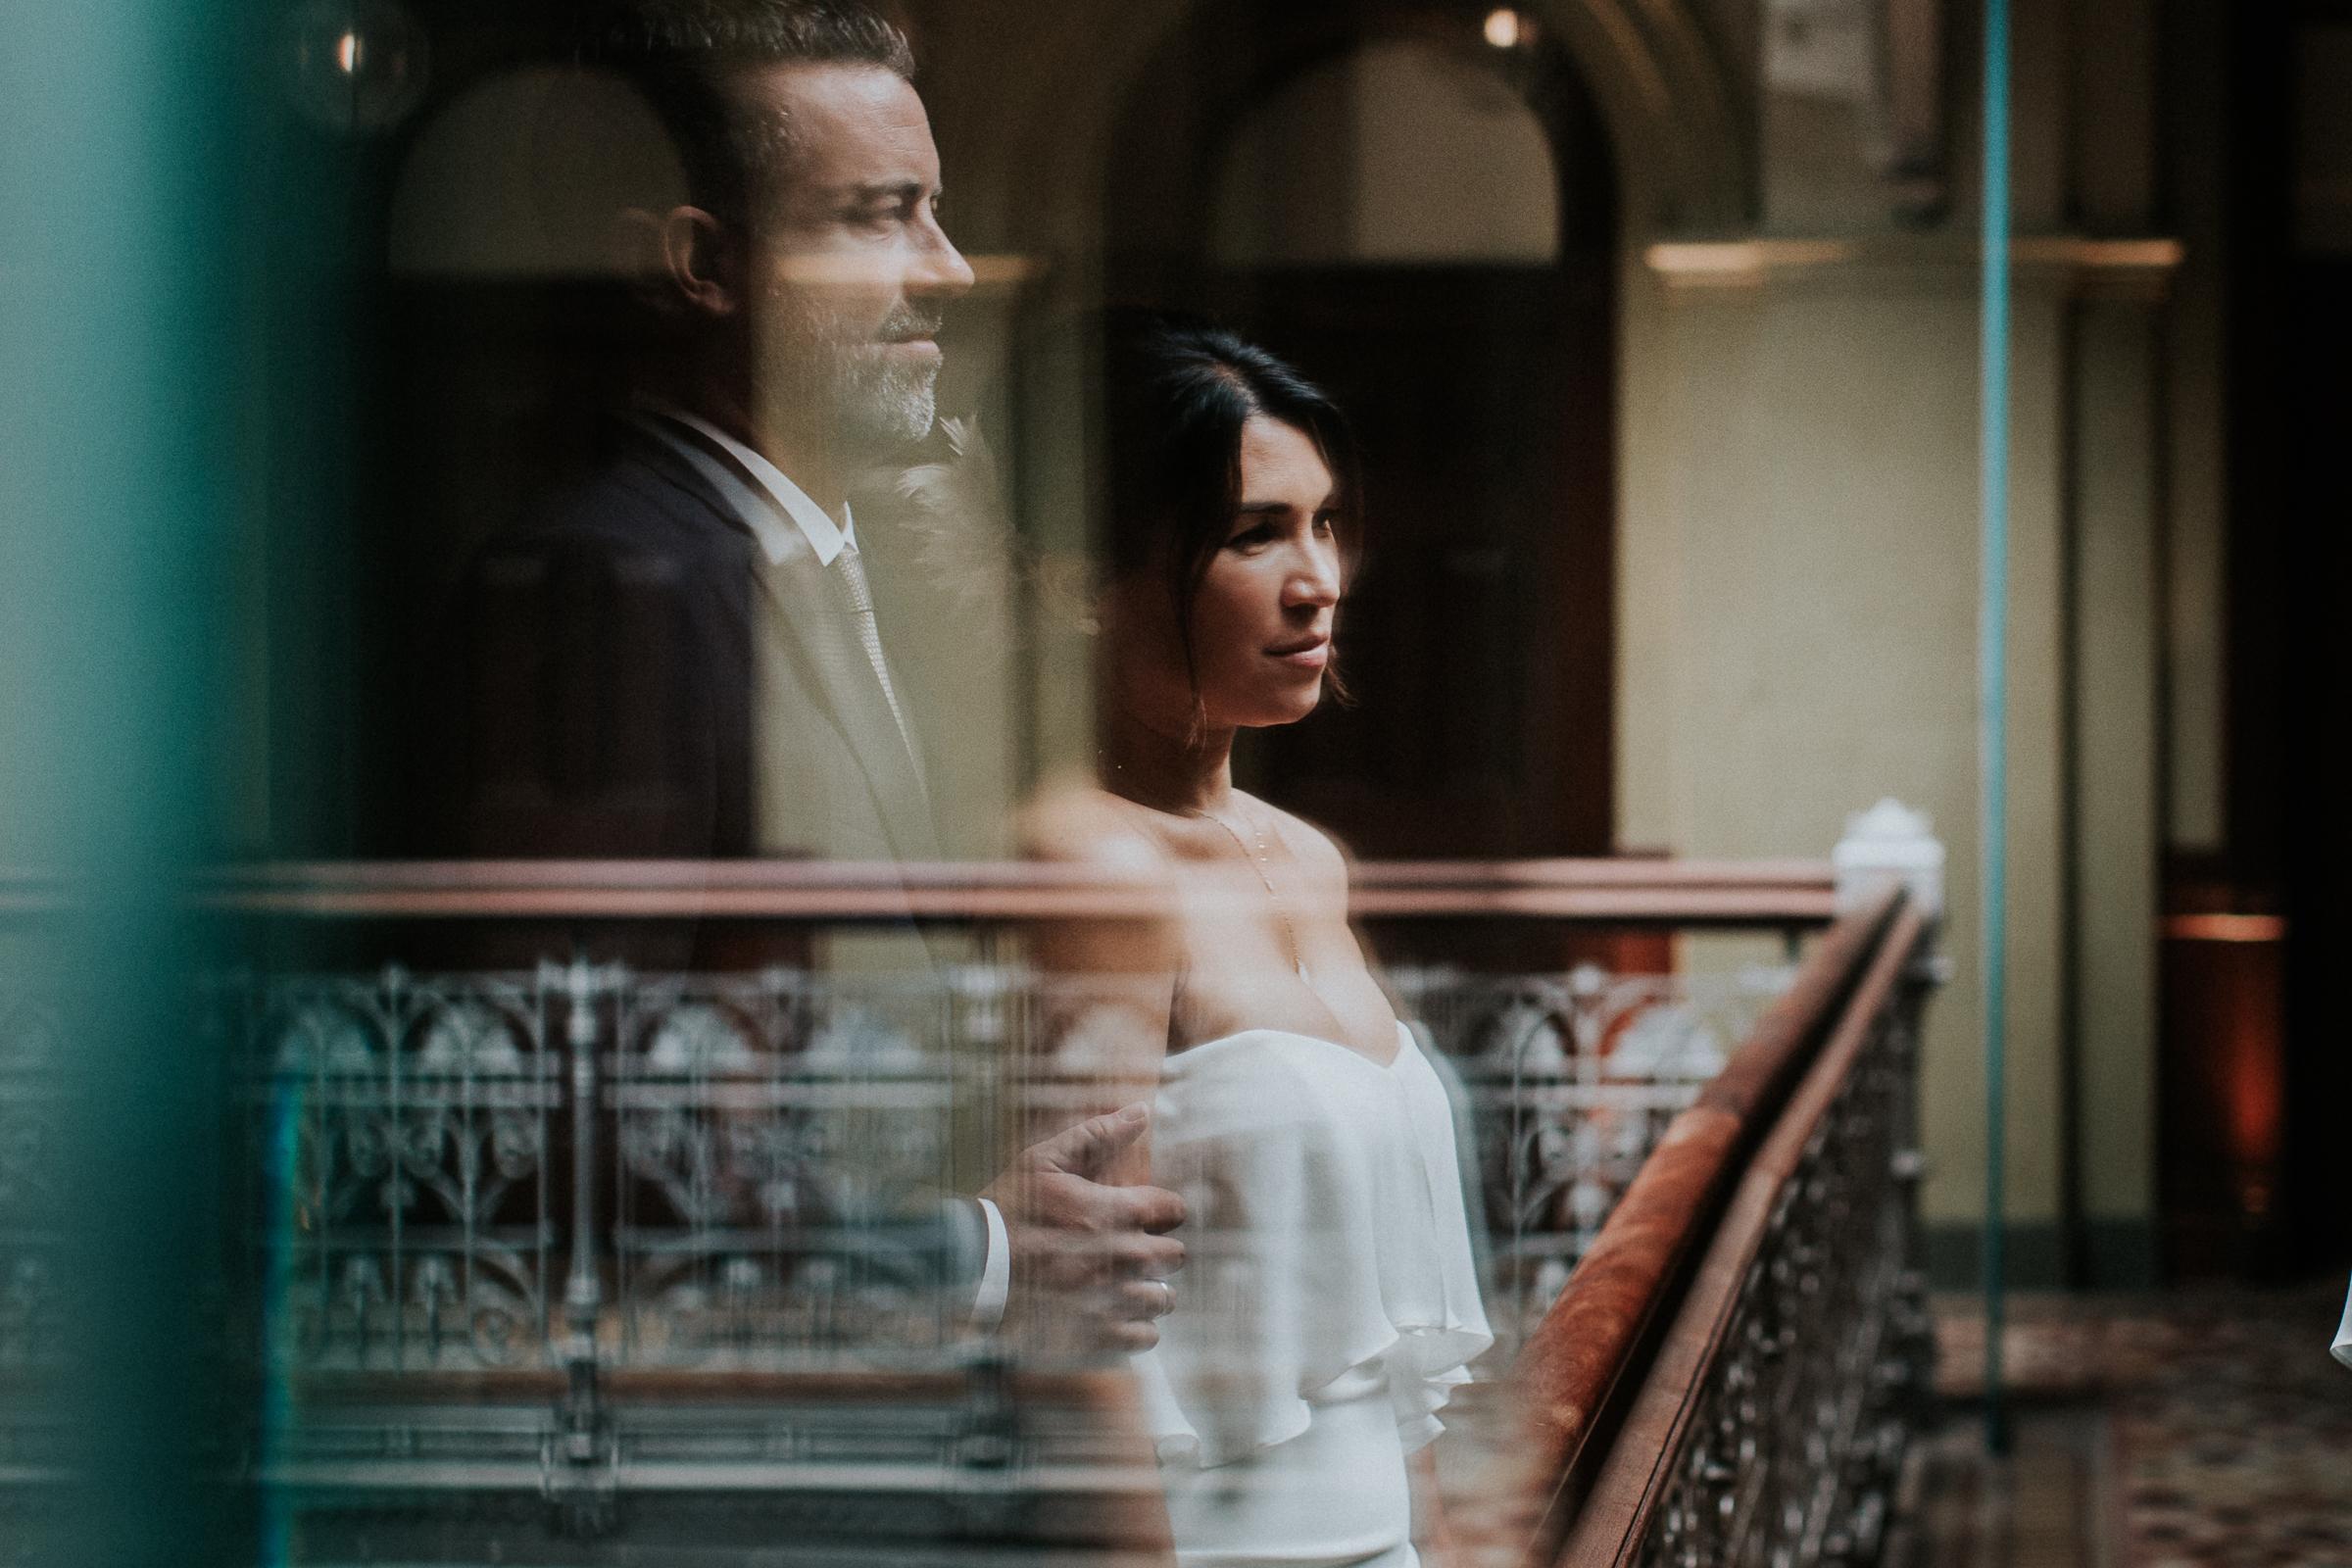 New-York-Documentary-Wedding-Photography-Best-Of-2017-by-Elvira-Kalviste-Photography-75.jpg